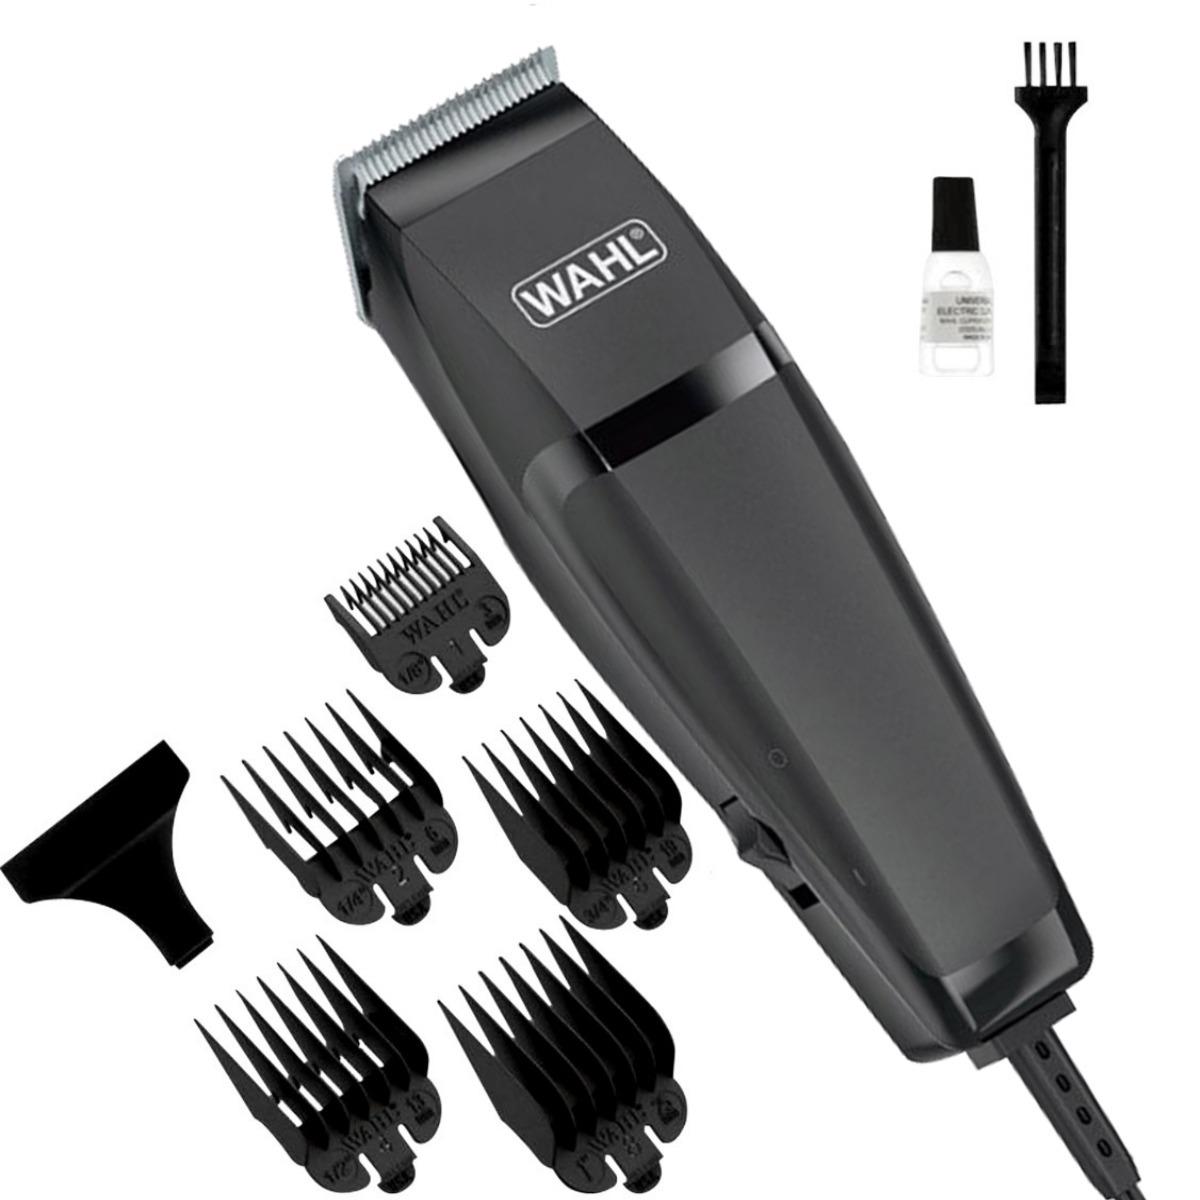 57ec0bfb6 cortador maquina de cabelo profissional wahl easy cut 220v. Carregando zoom.